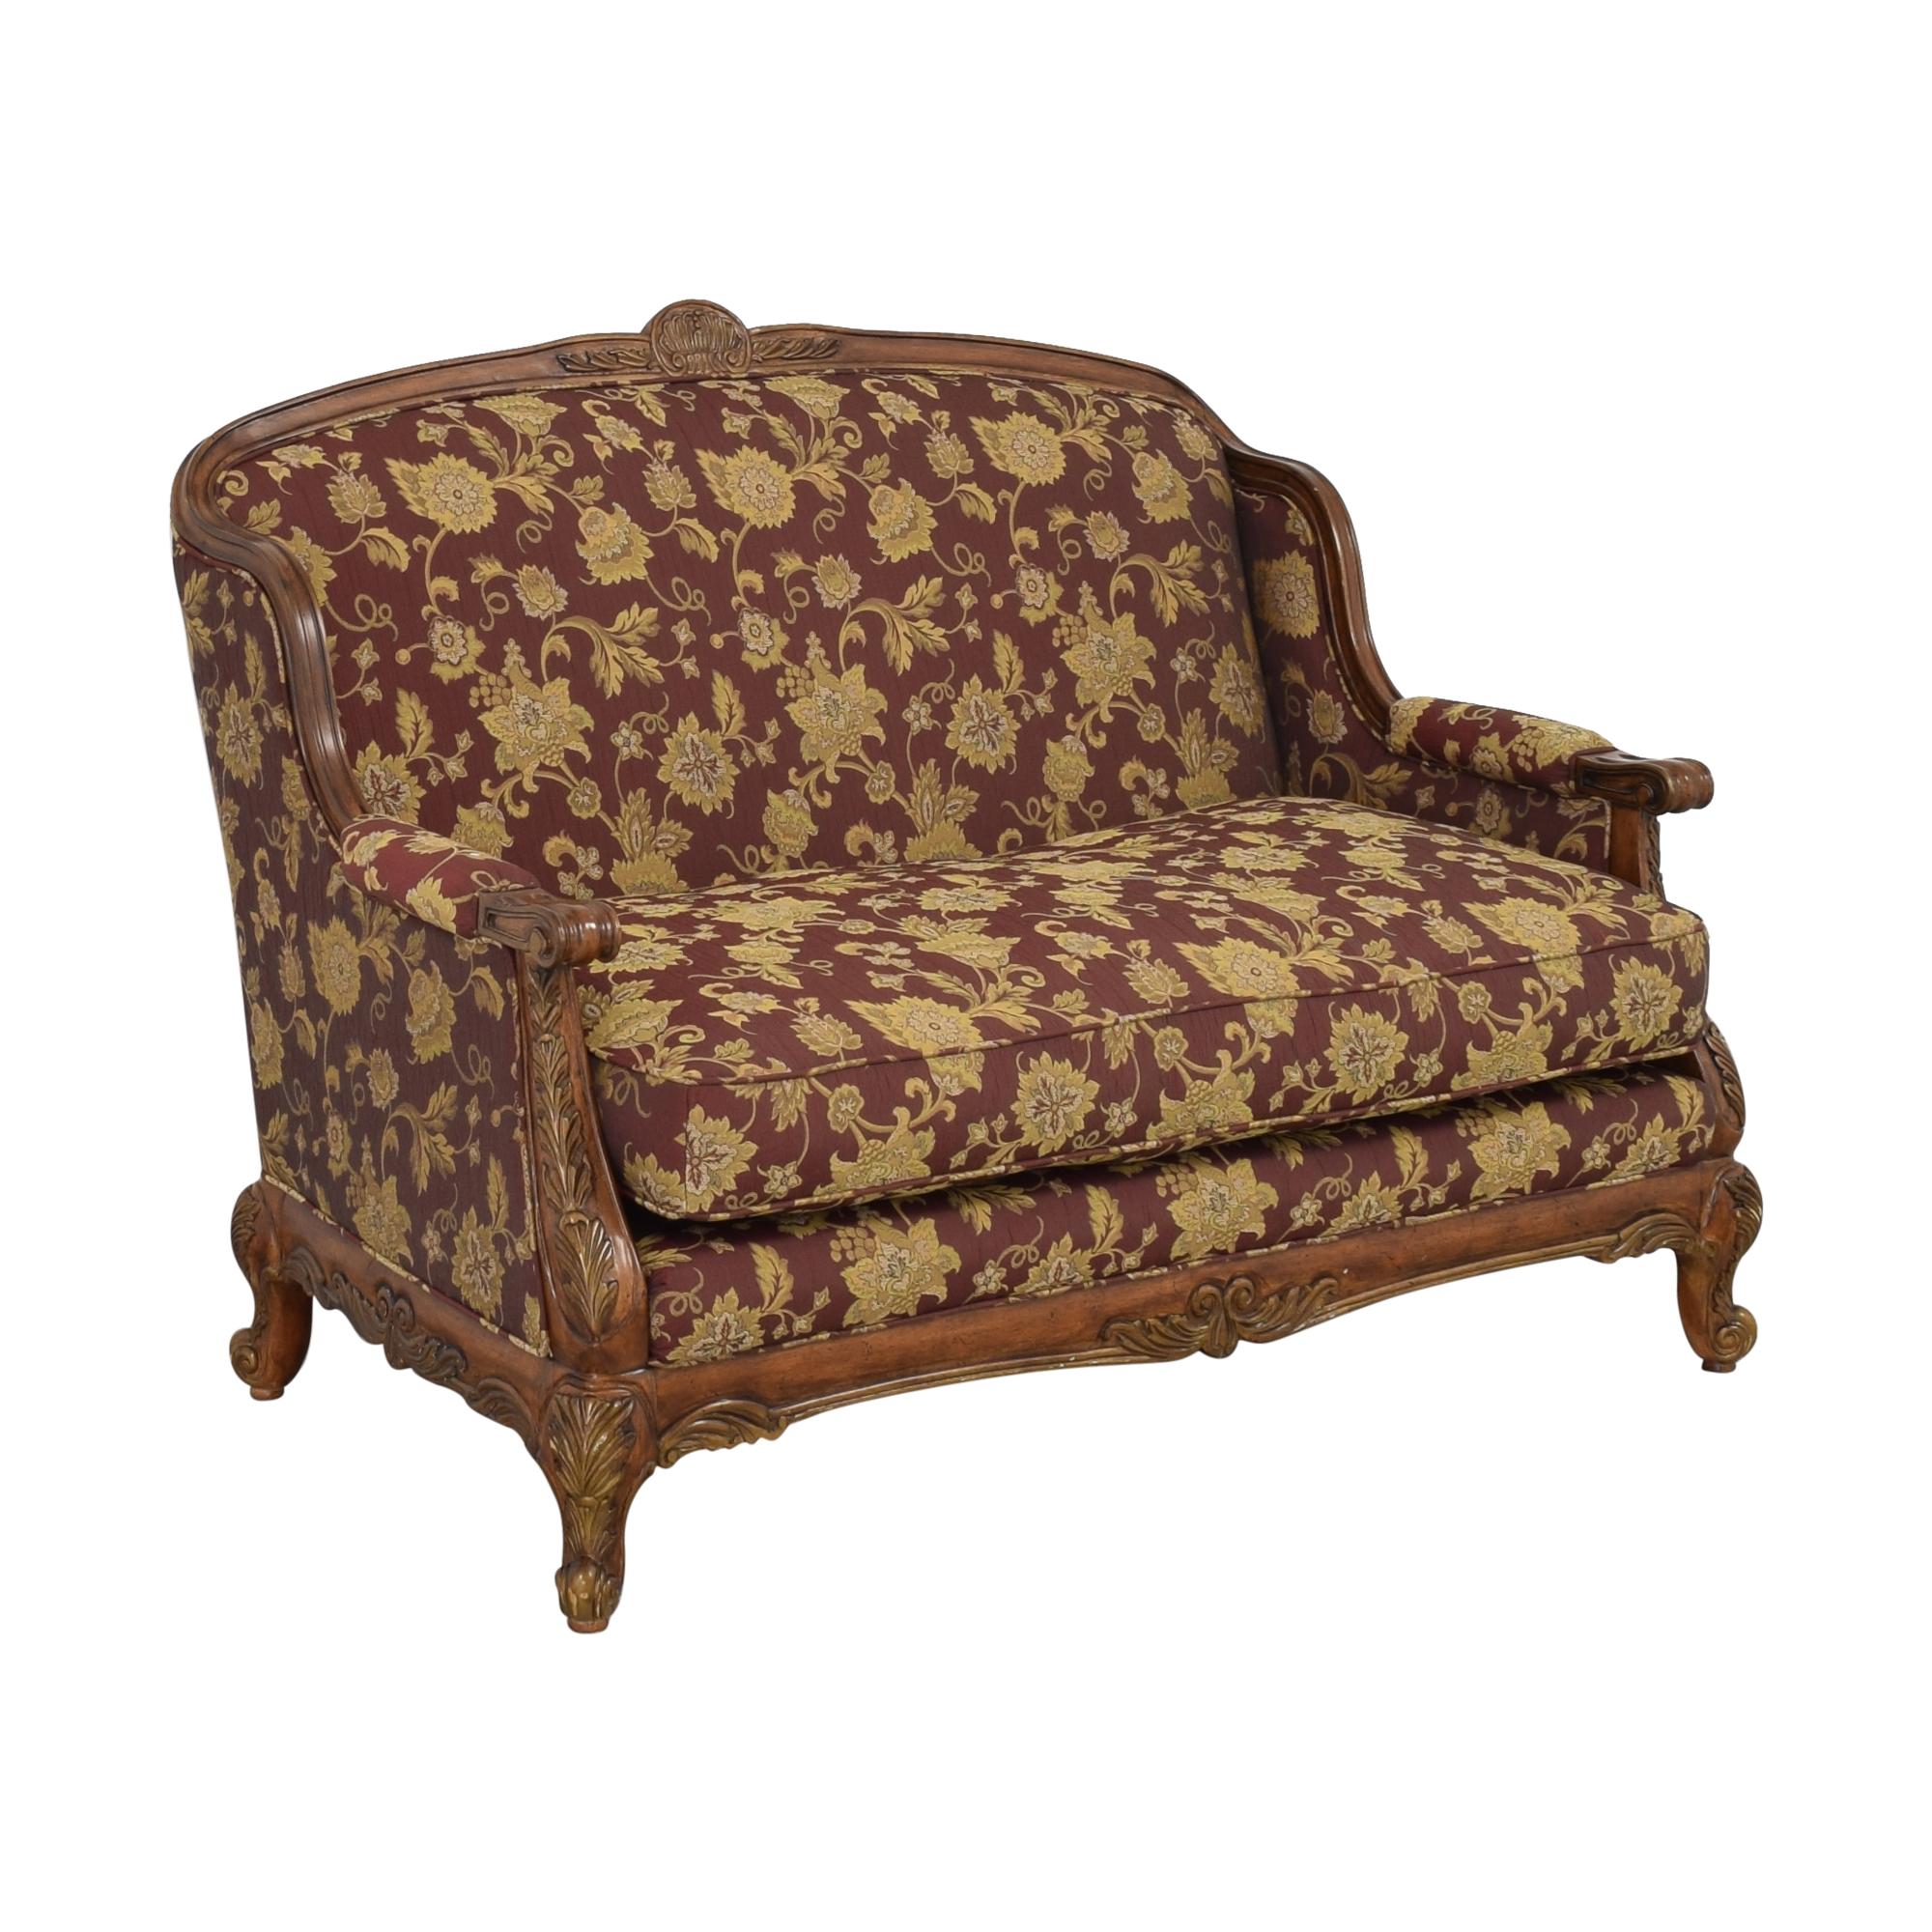 Universal Furniture Universal Furniture Settee second hand